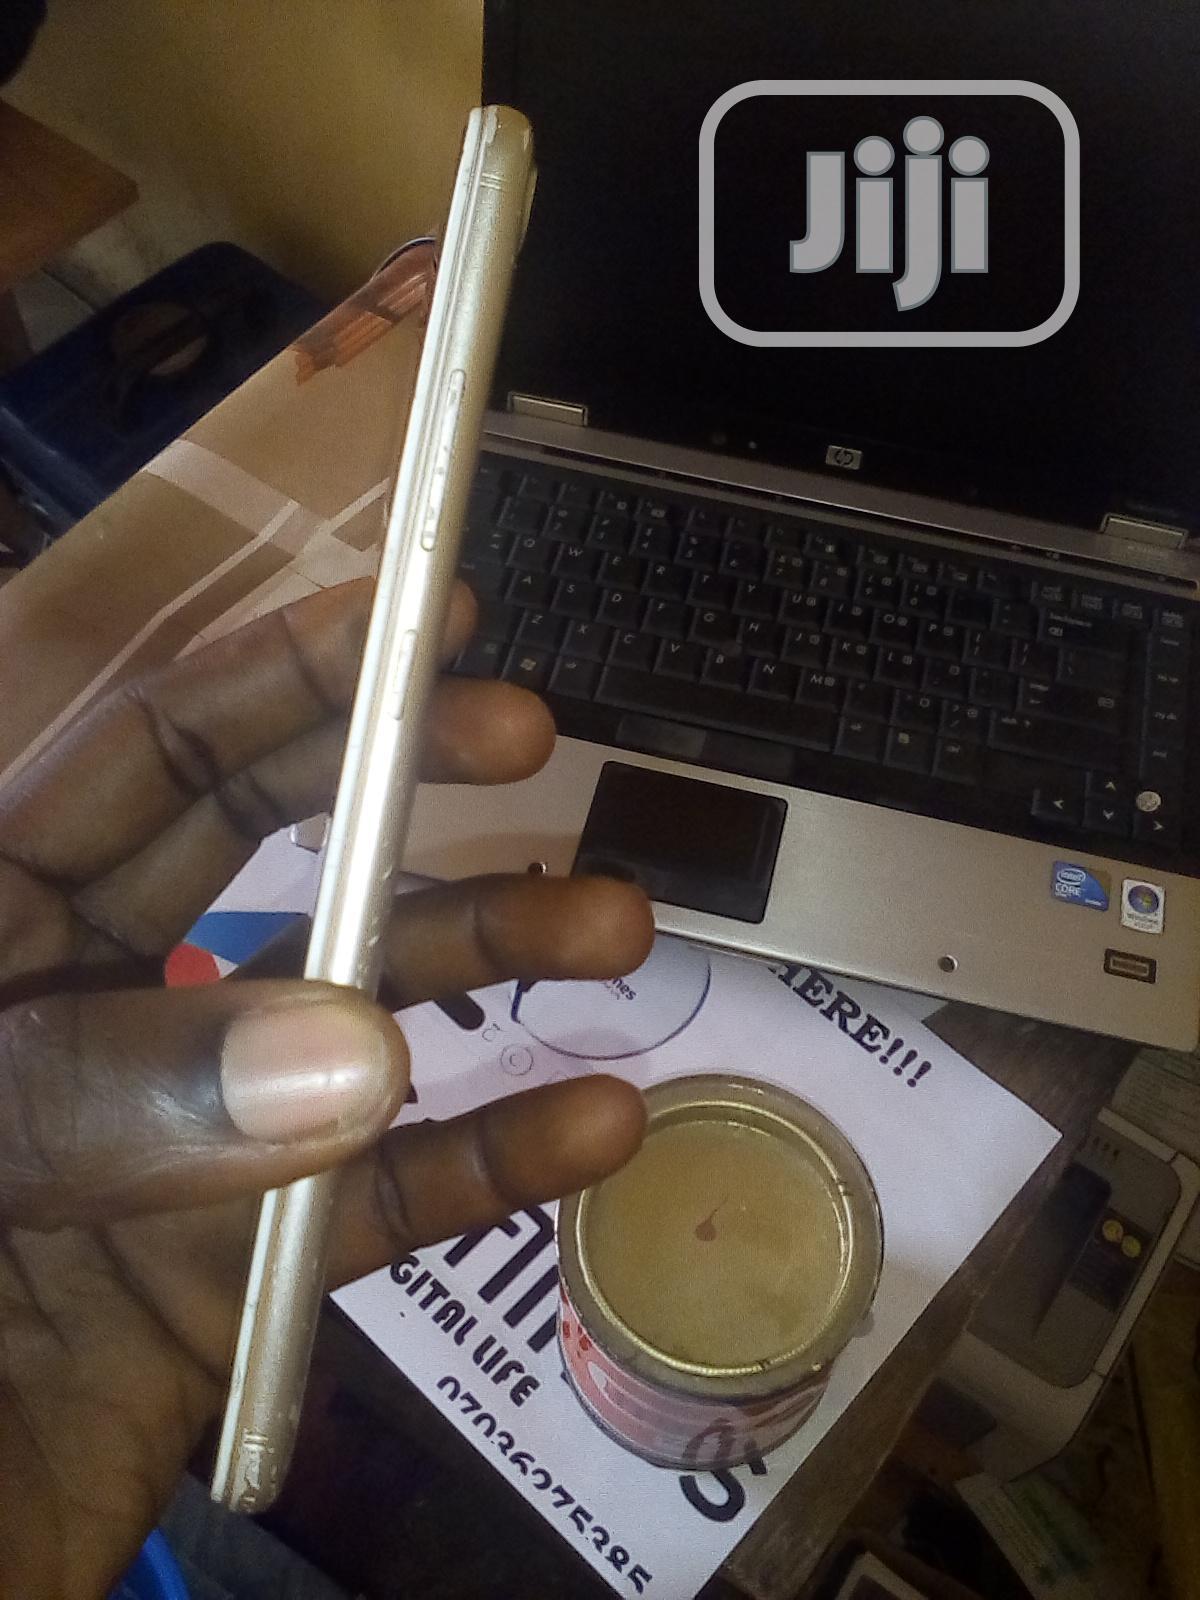 Infinix Hot 6 Pro 16 GB Gold   Mobile Phones for sale in Ado Ekiti, Ekiti State, Nigeria